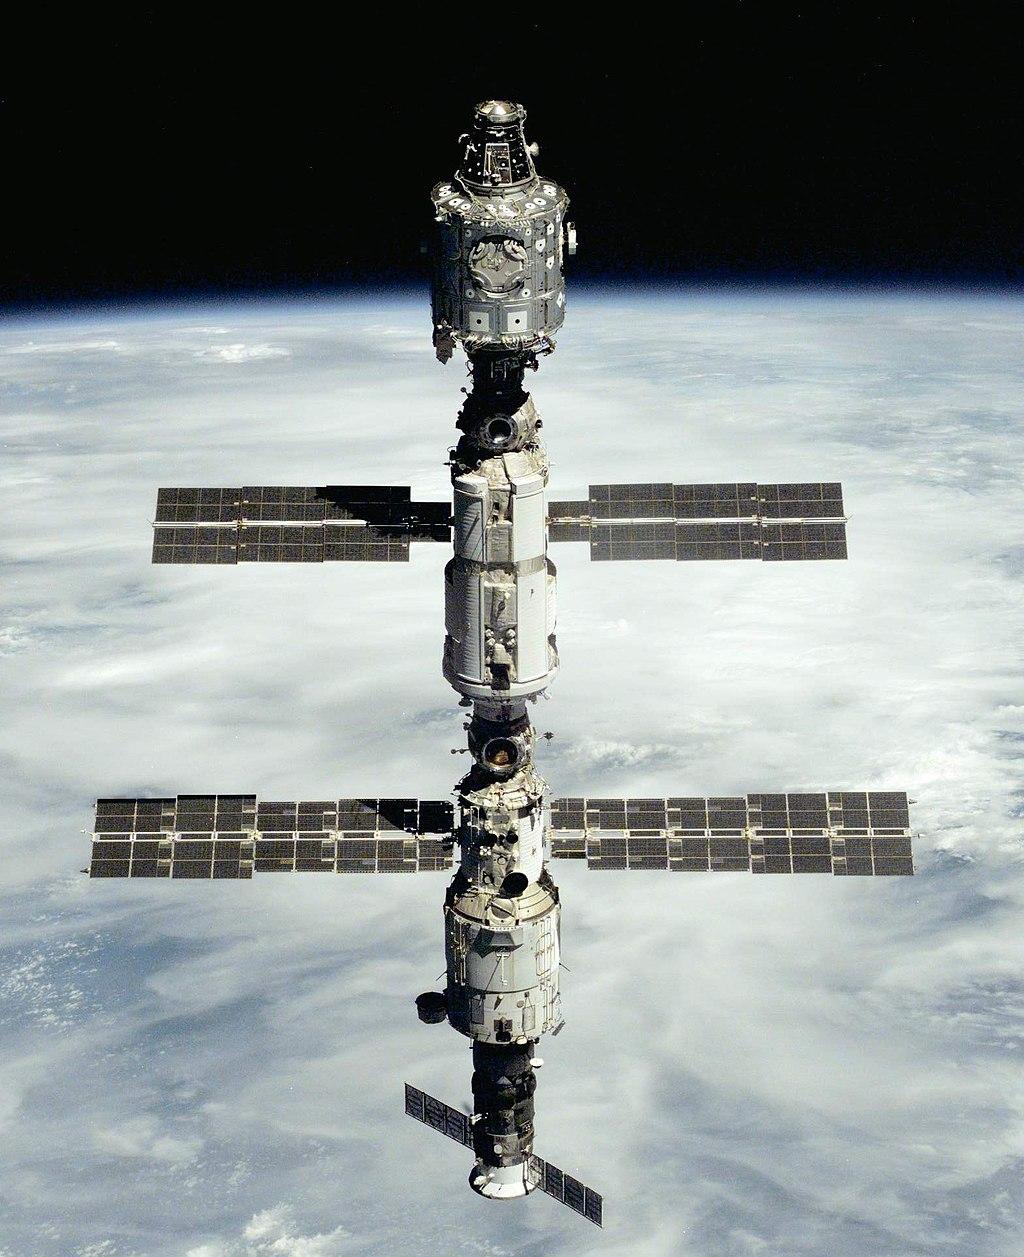 МКС Июль 2000 года.